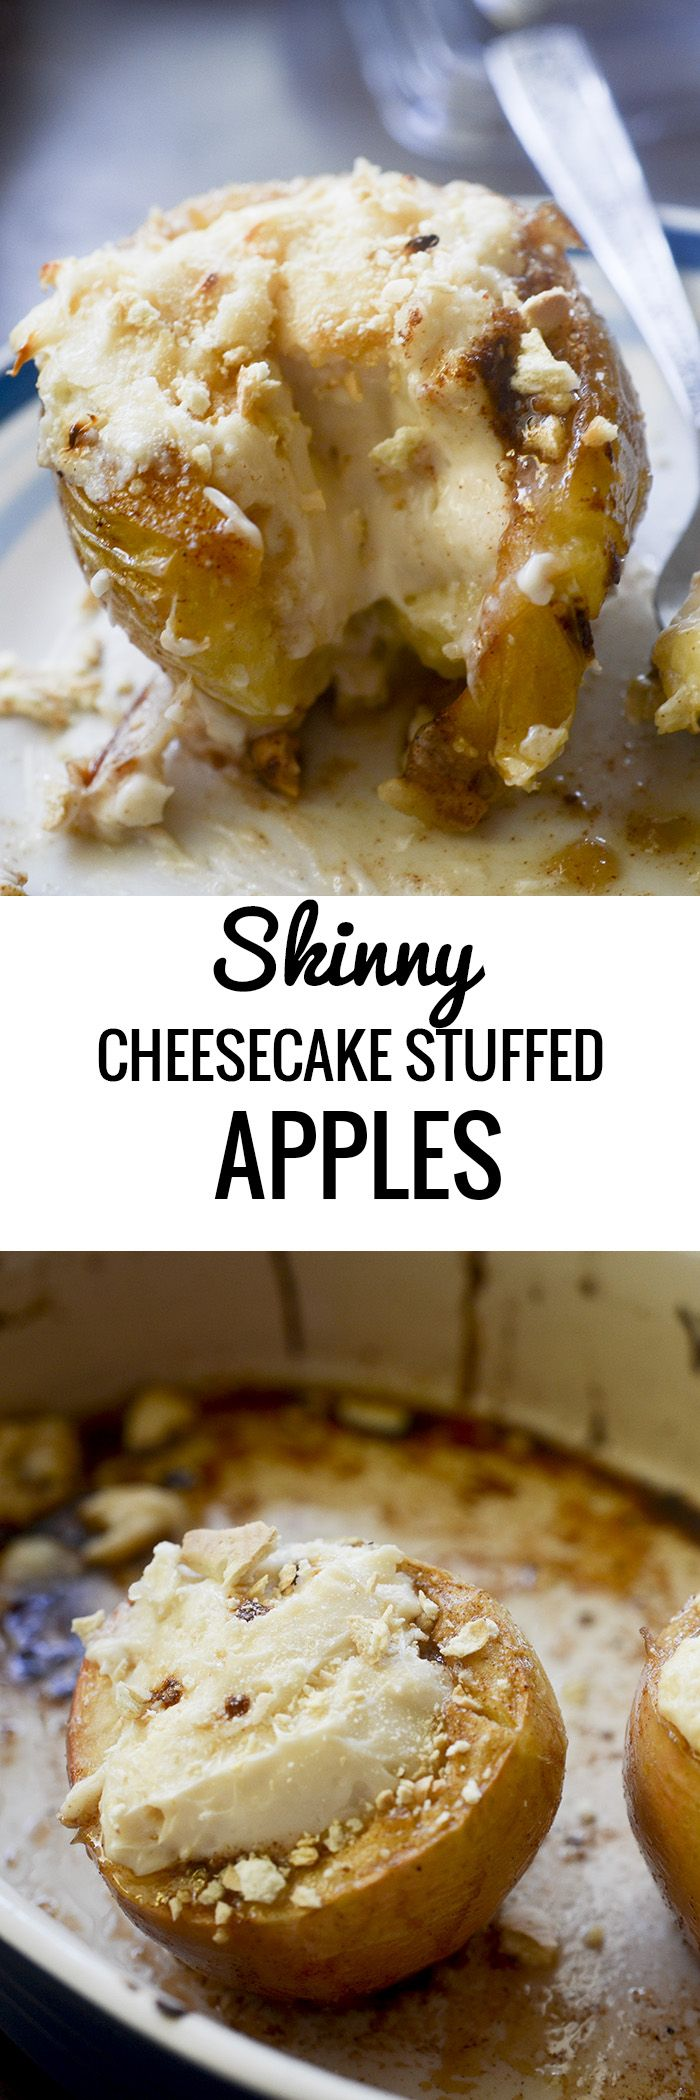 Skinny Cheesecake Stuffed Apples - Recipe Diaries